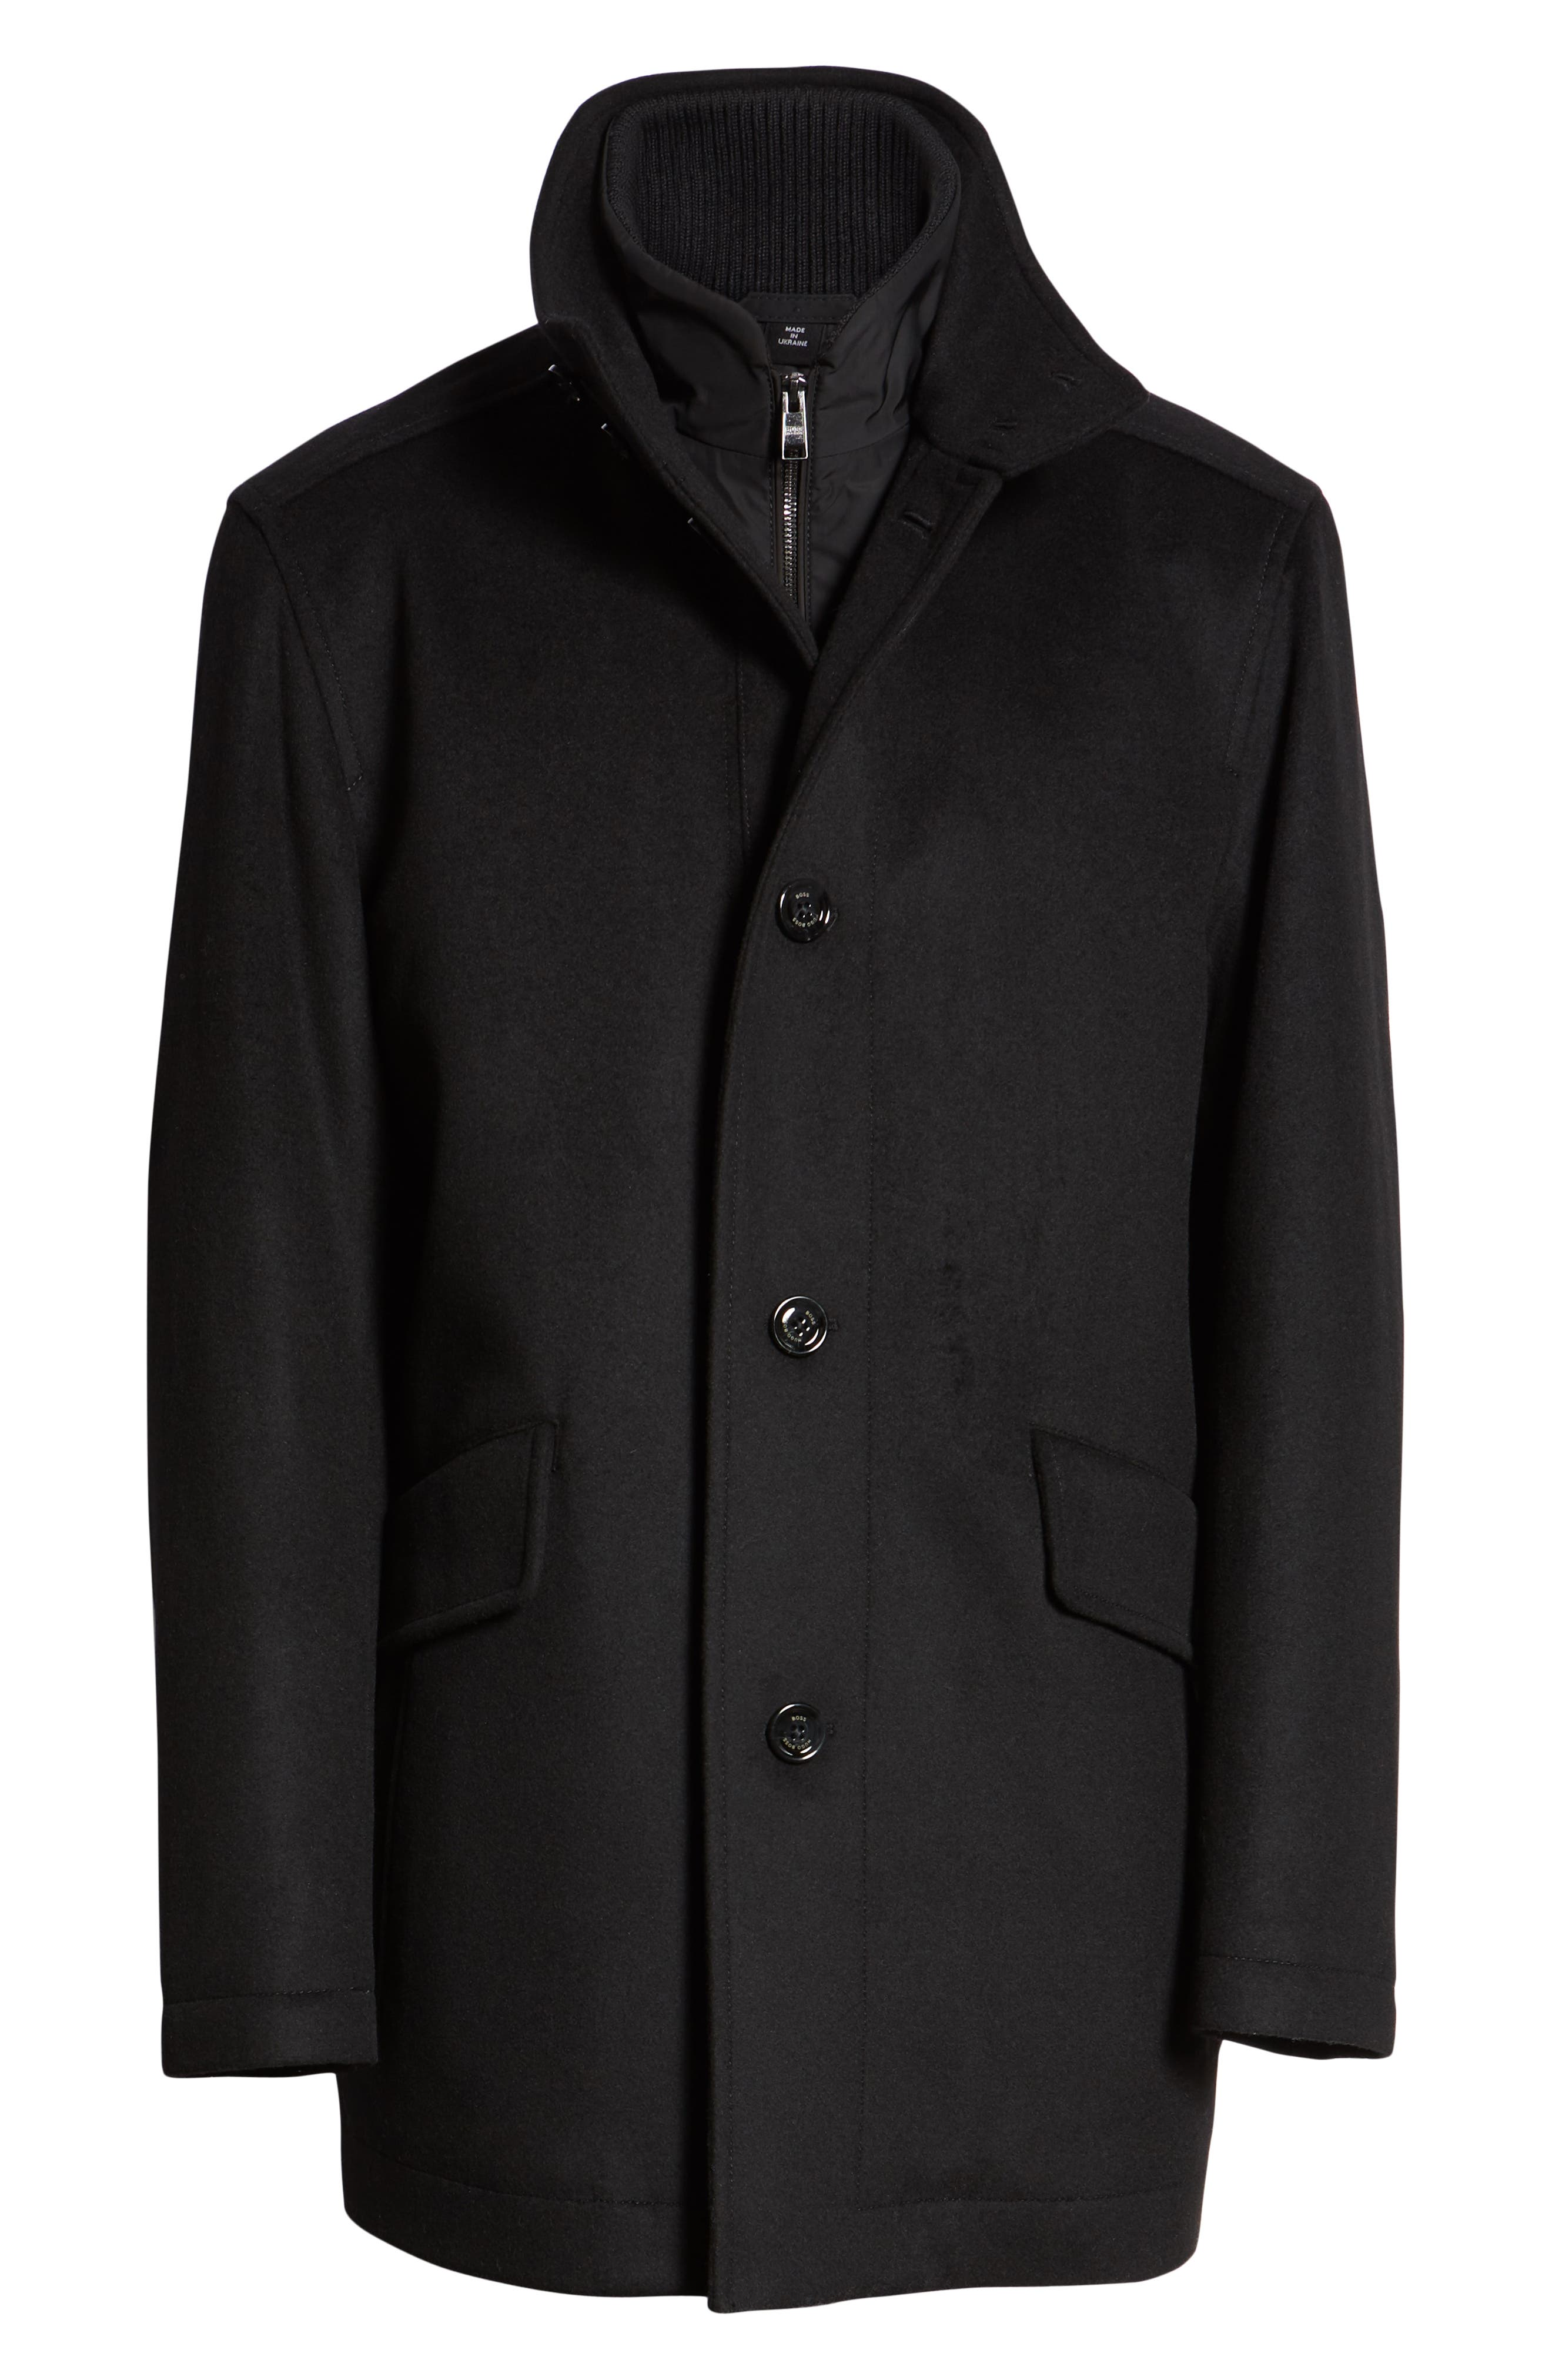 Coxtan Wool Regular Fit Car Coat,                             Alternate thumbnail 6, color,                             BLACK